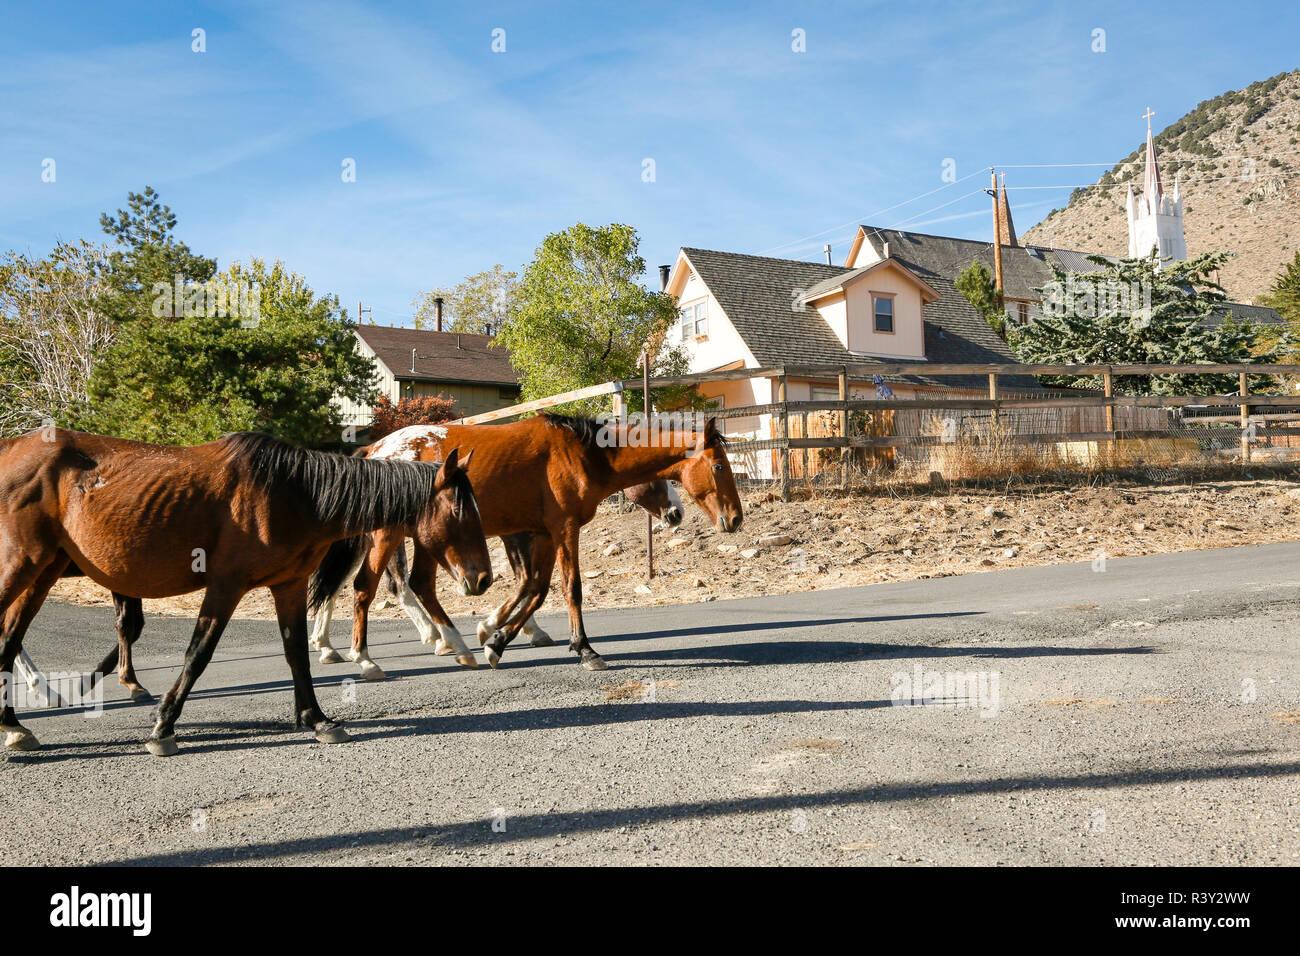 Wild horses roaming through town, Virginia City, Nevada, USA - Stock Image